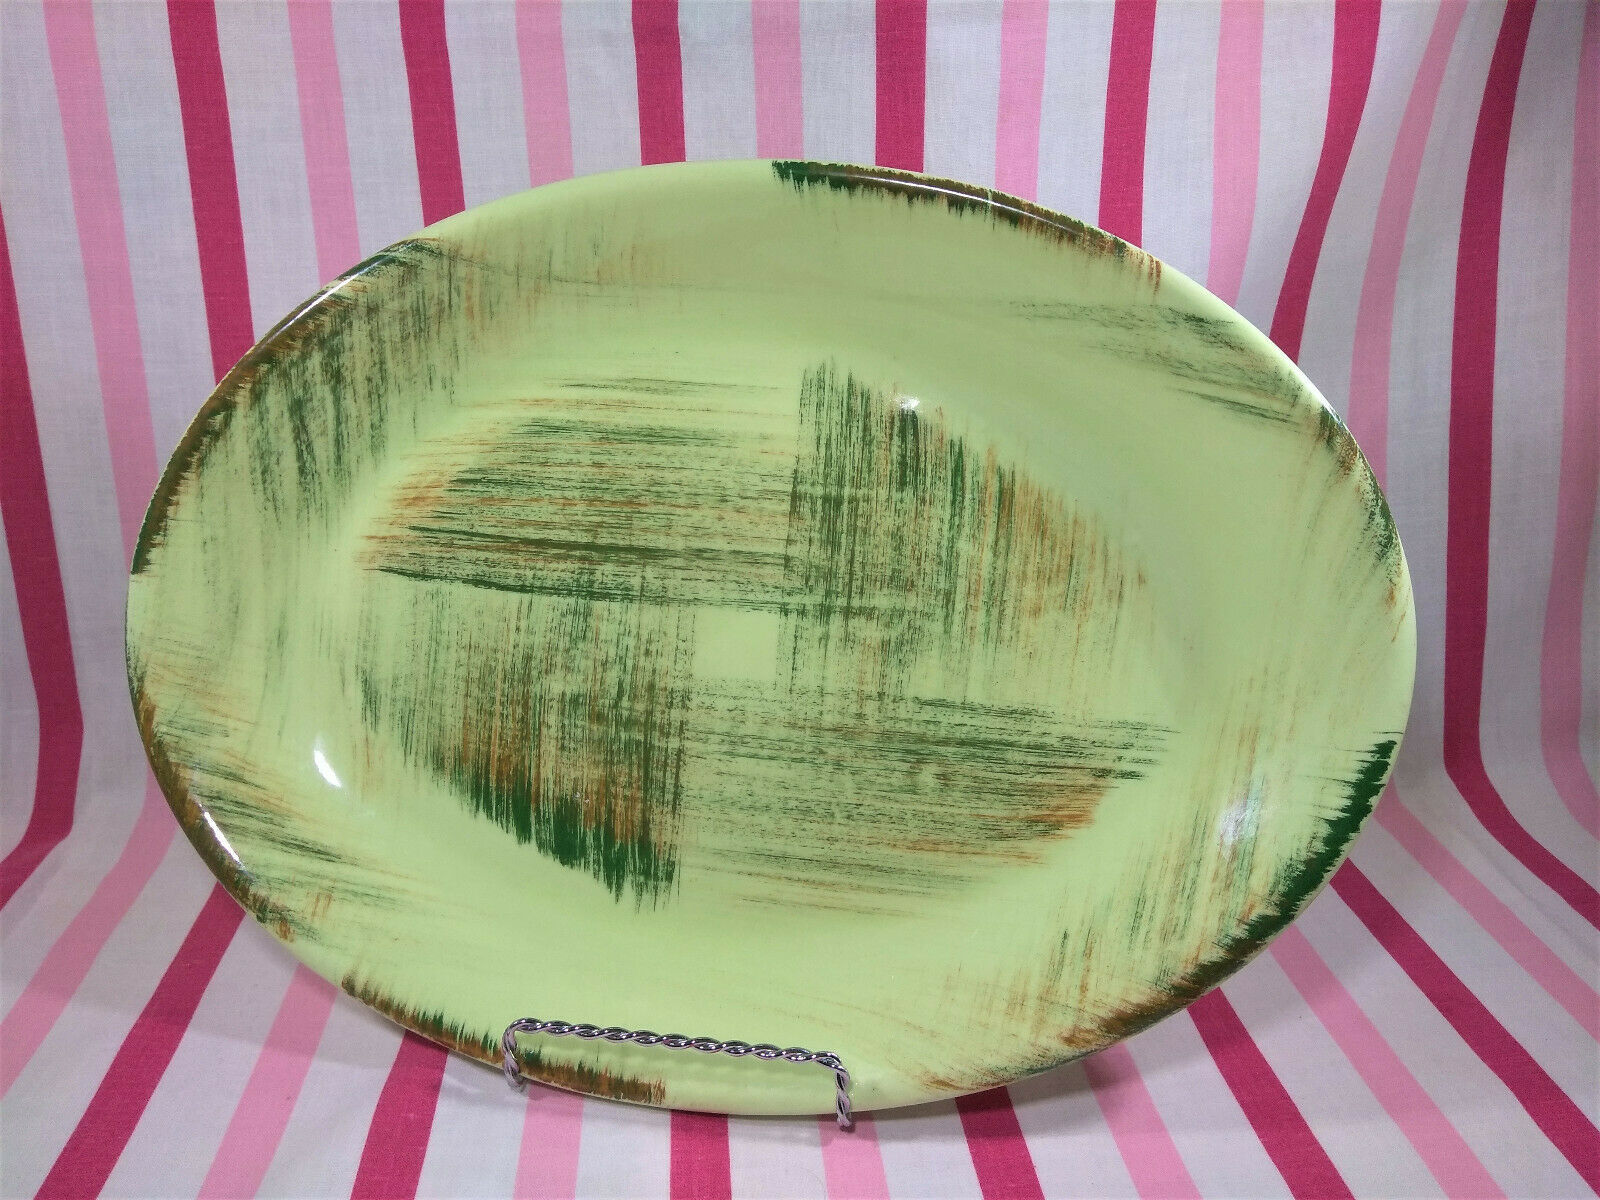 Metlox pottery vtg mid century Vernonware rare Raffia ceramic cups saucers set!